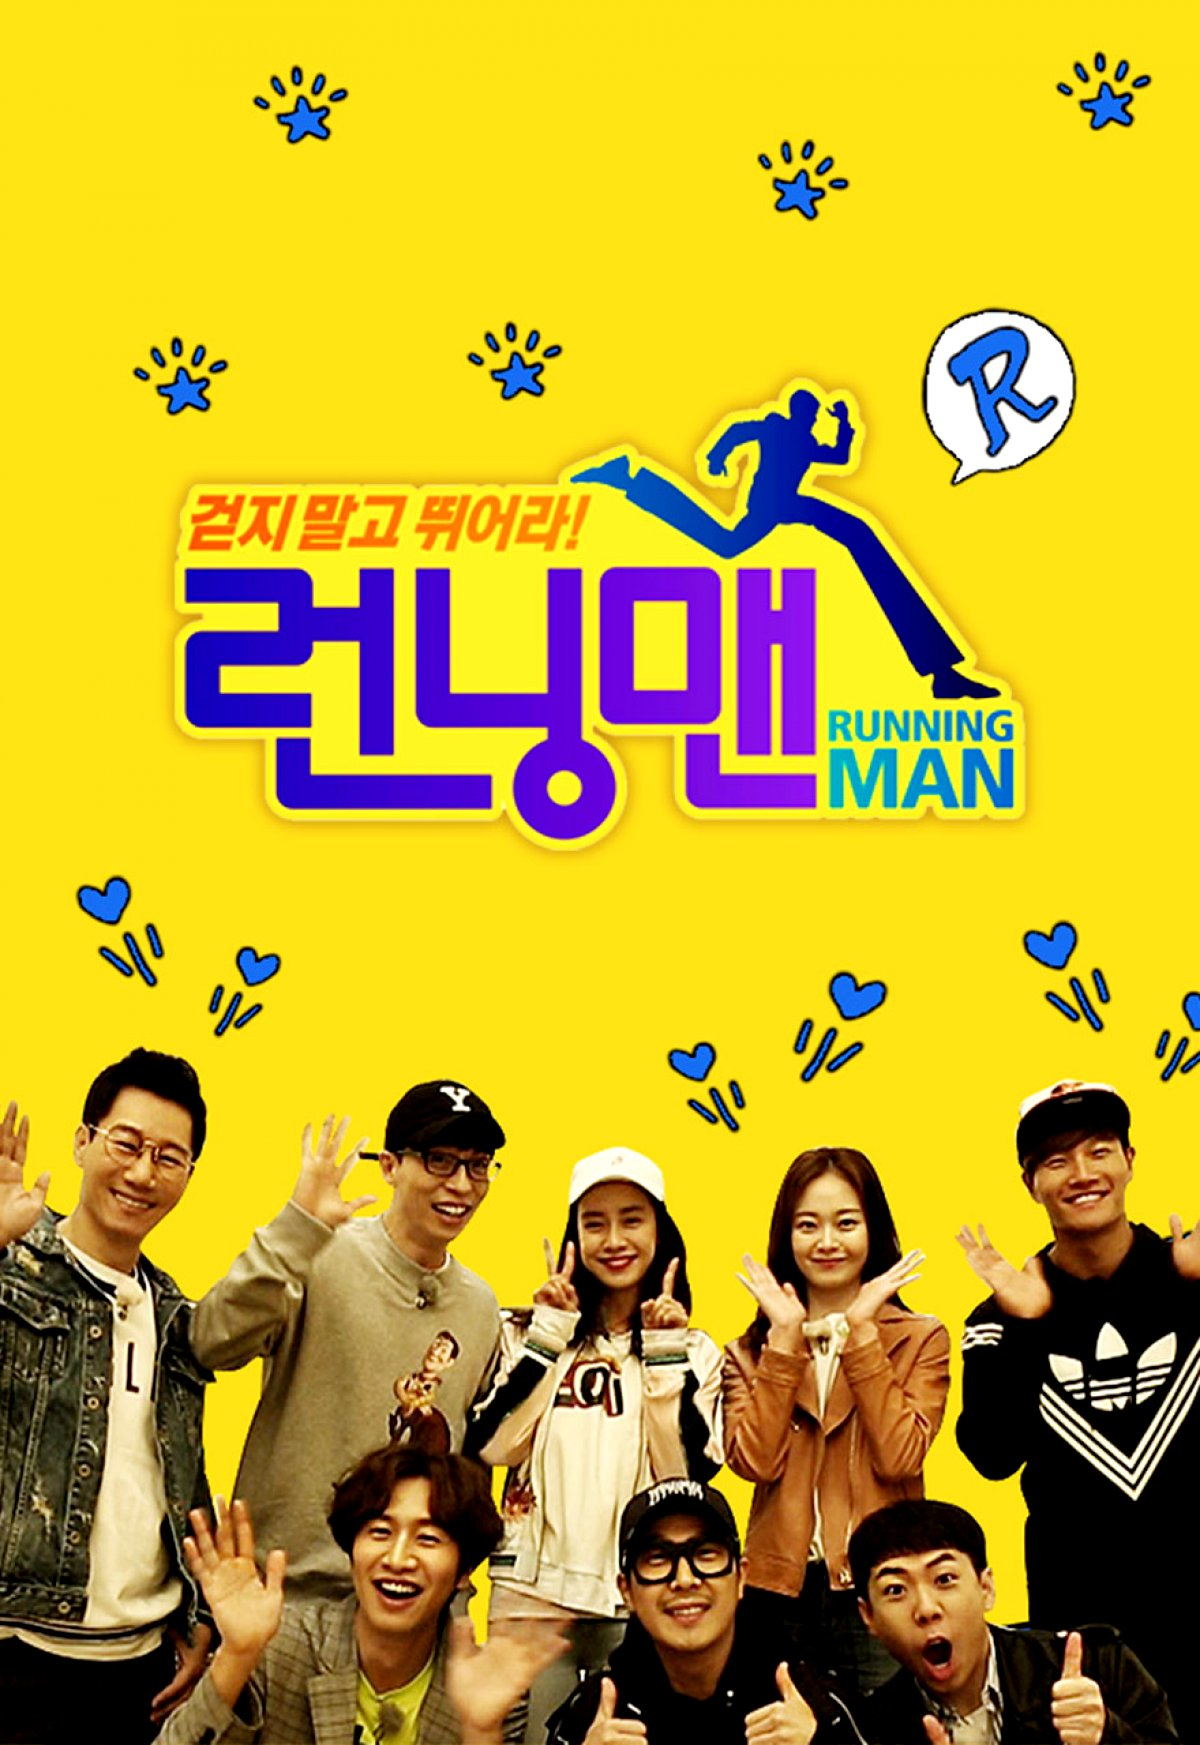 Running Man | Wiki Drama | FANDOM powered by Wikia